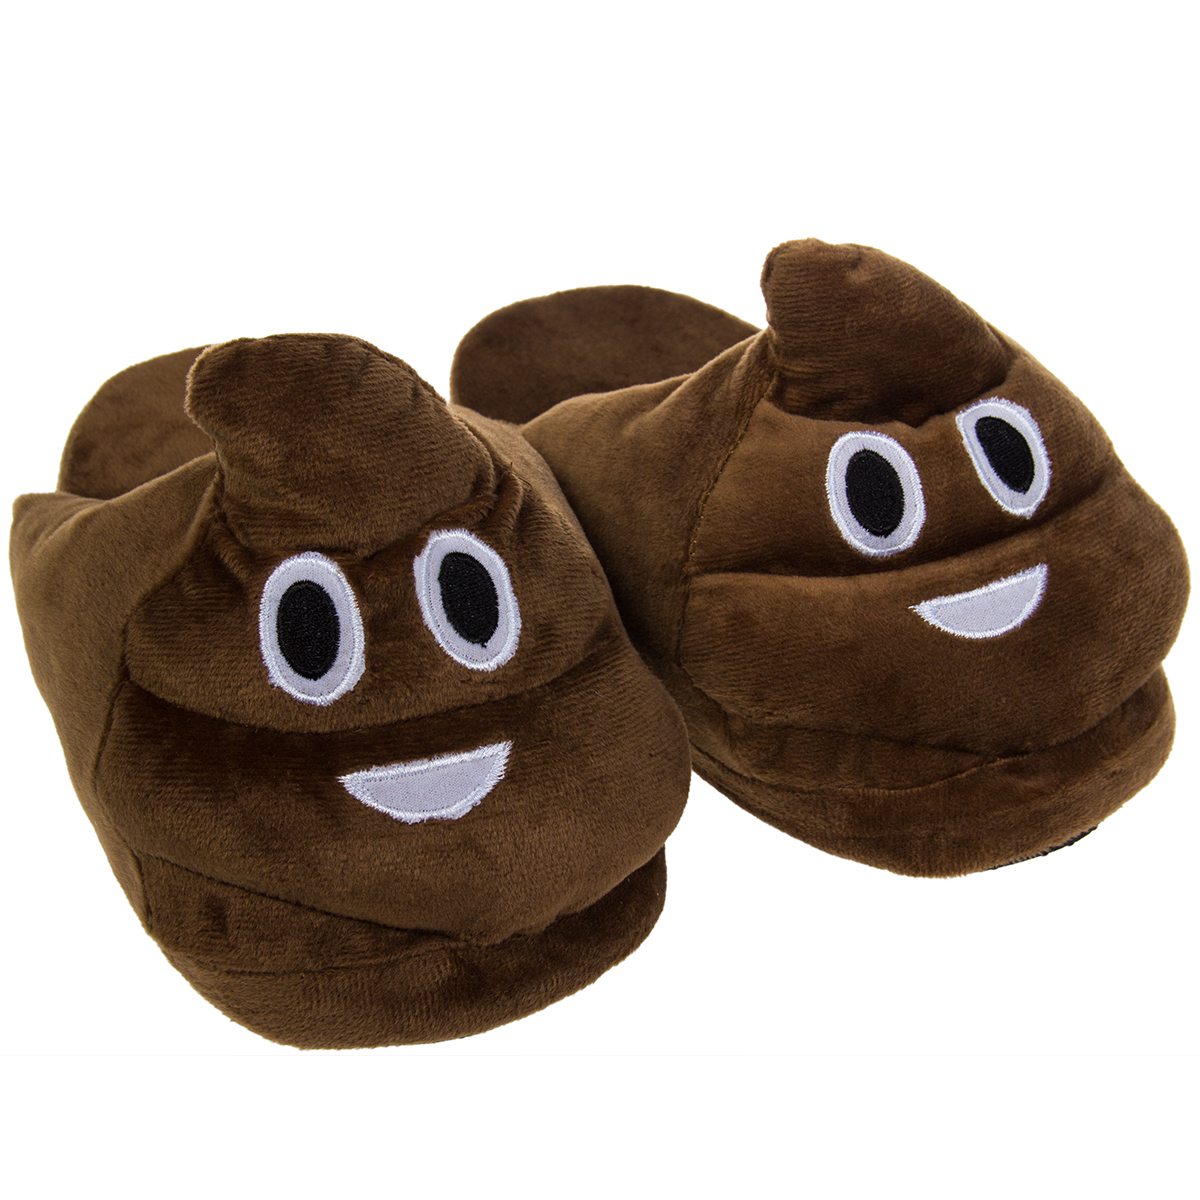 Emoji House Slippers Funny Soft Plush For Adults Kids Teens Bedroom Smiley Poop Ebay